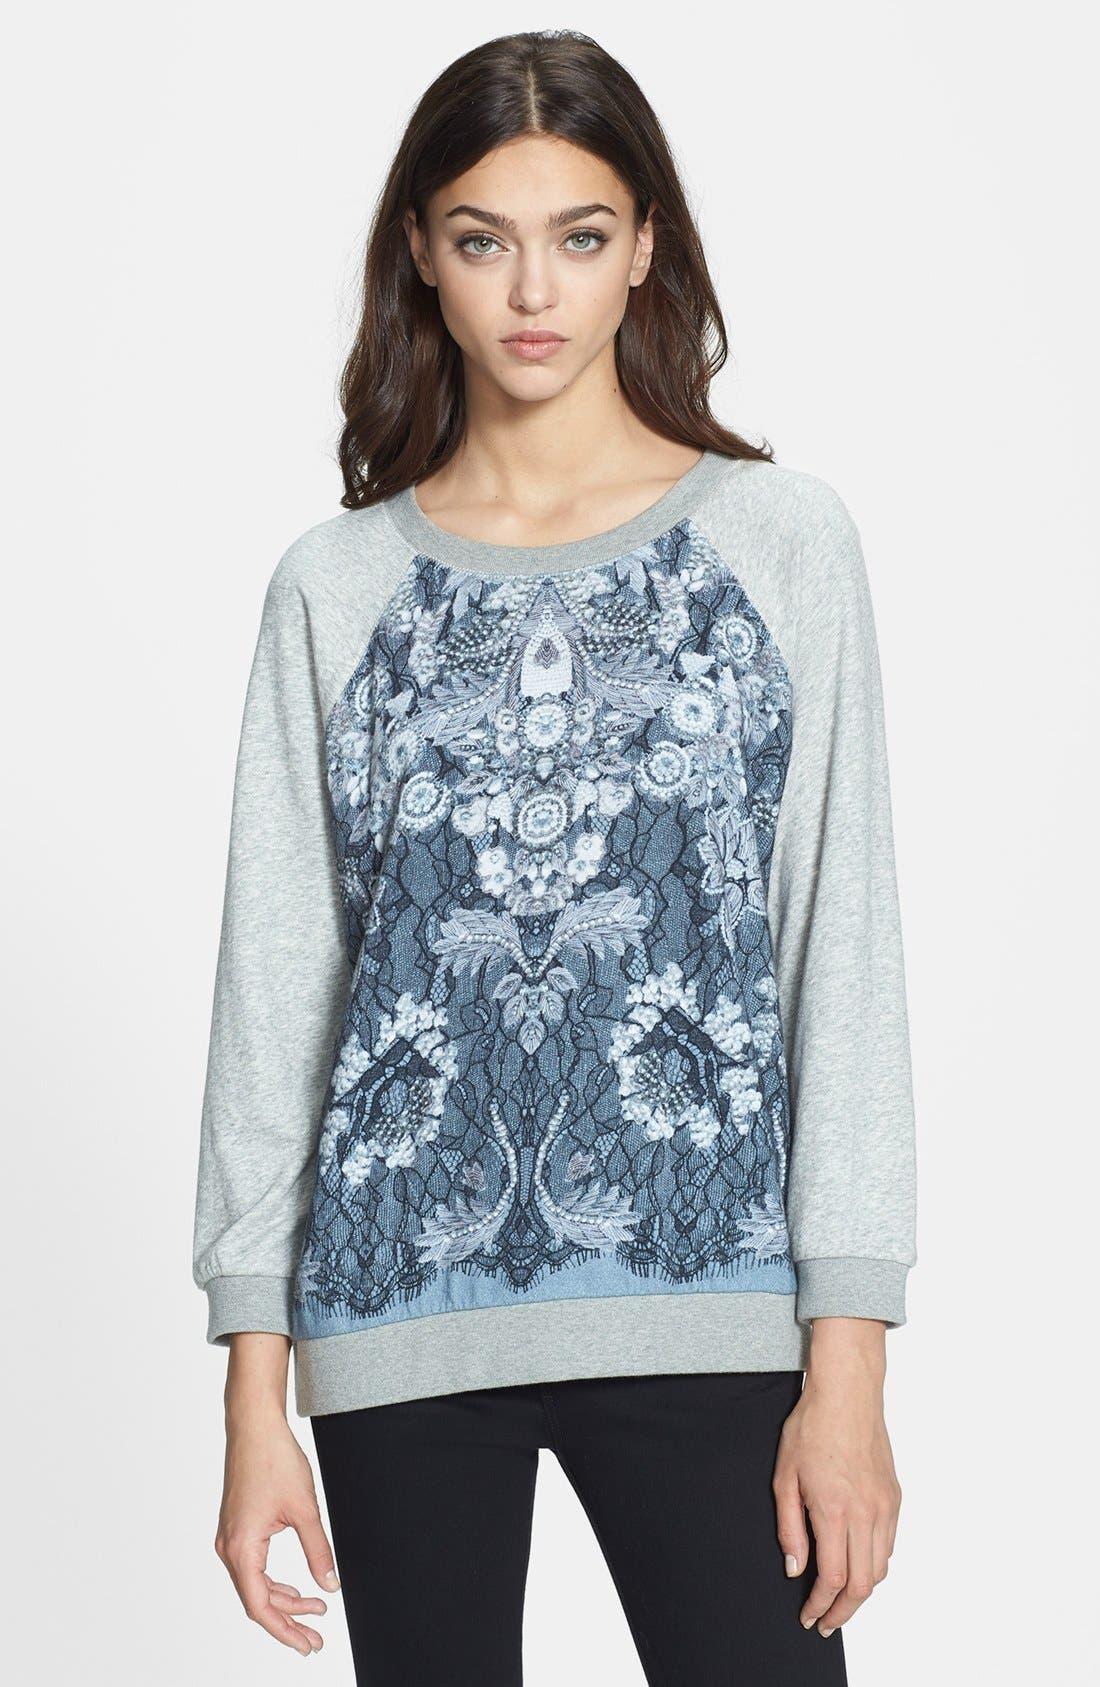 Alternate Image 1 Selected - MARC BY MARC JACOBS 'Lena' Print Cotton Sweatshirt